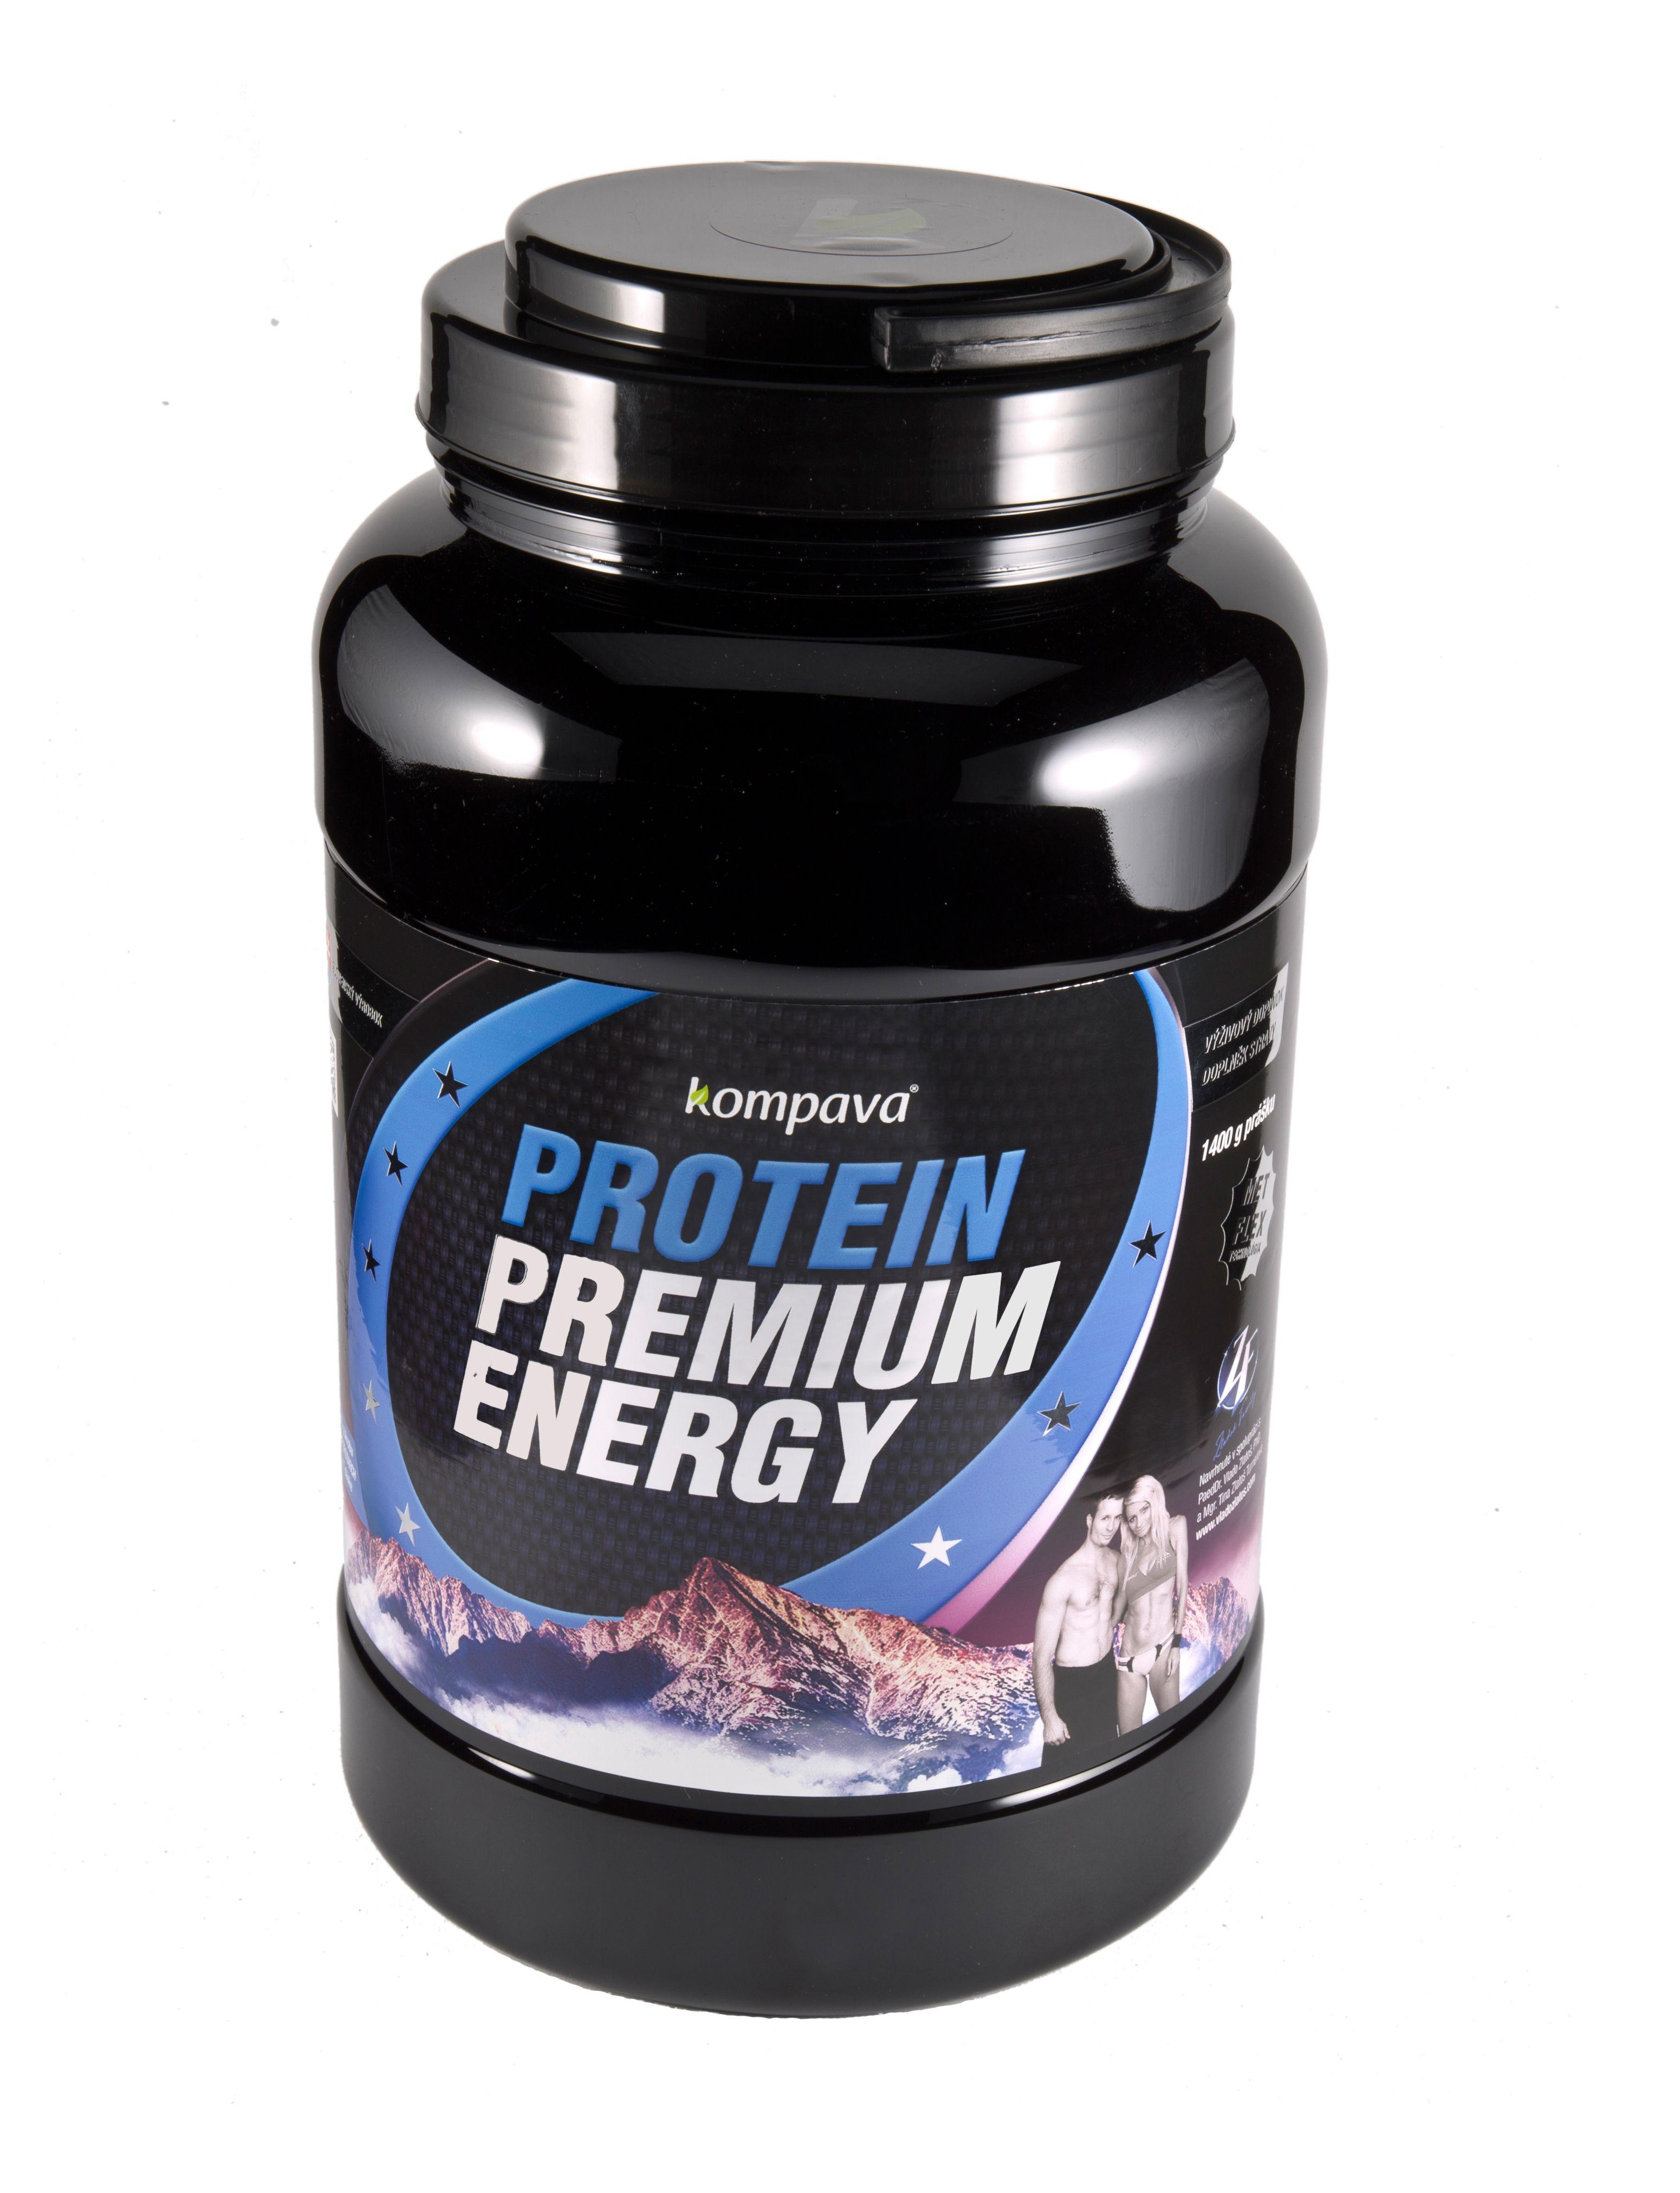 kompava protein premium energy 1400g